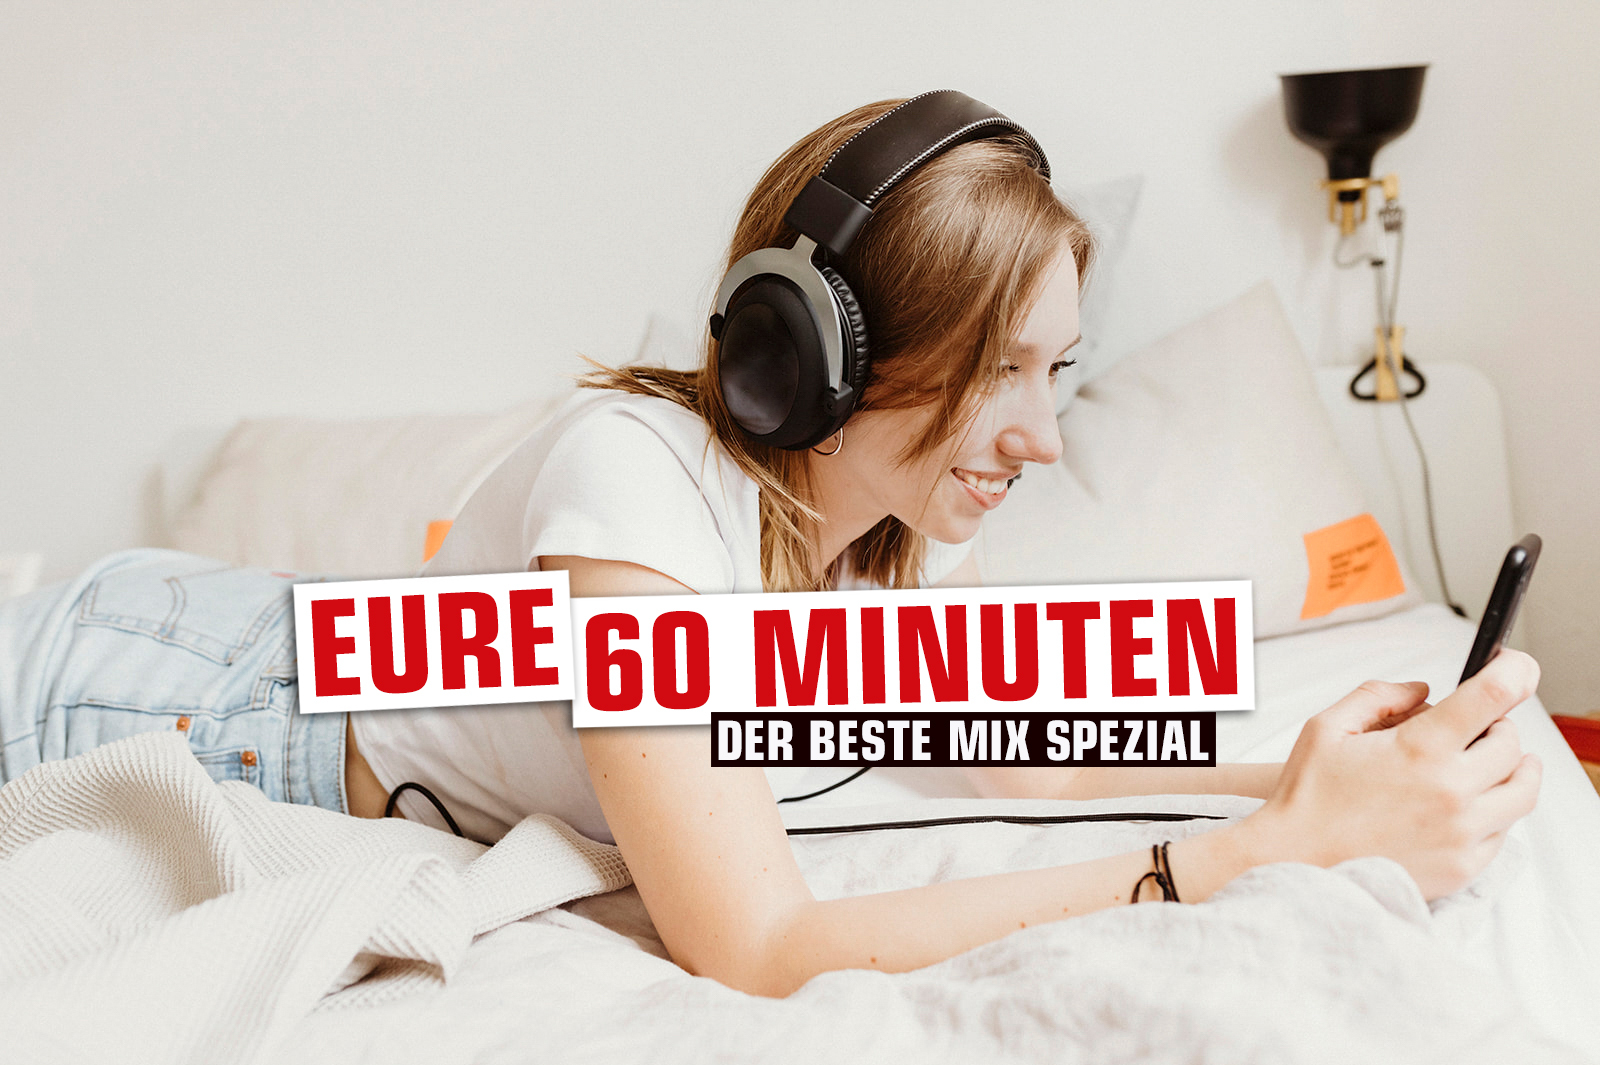 eure-60-minuten-beste-mix-spezial-motiv